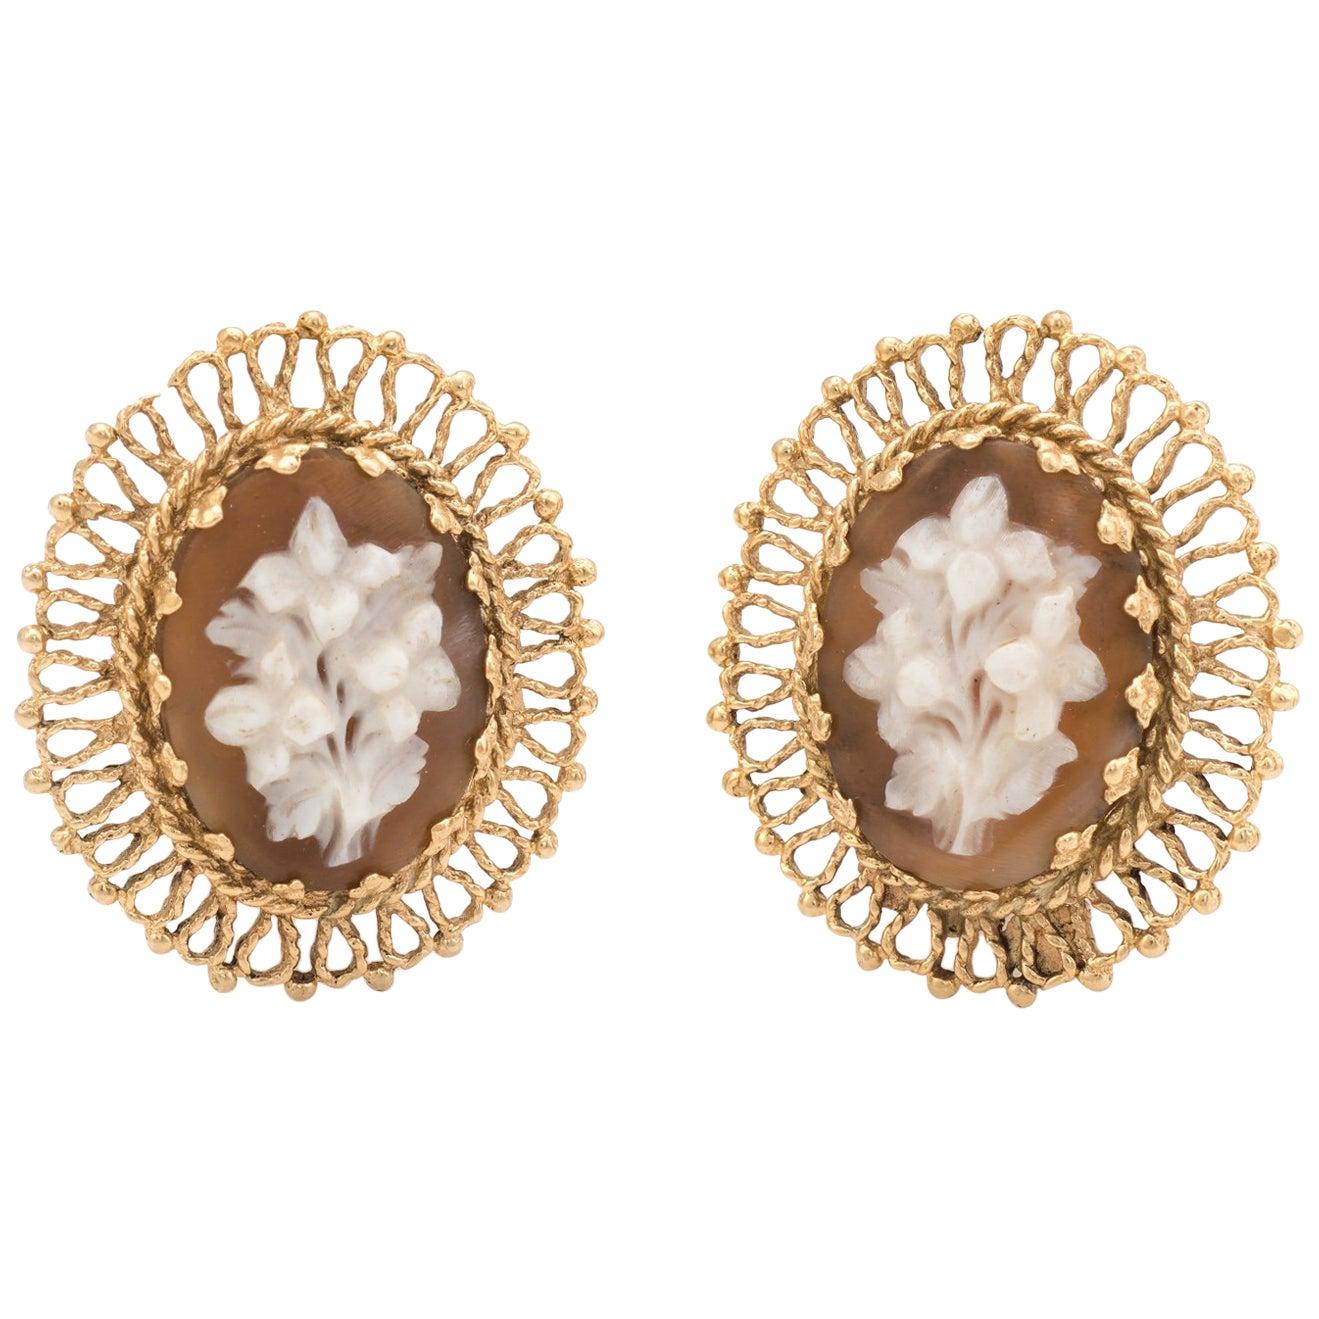 Bouquet of Flowers Cameo Clip Earrings Vintage 14 Karat Gold Estate Jewelry